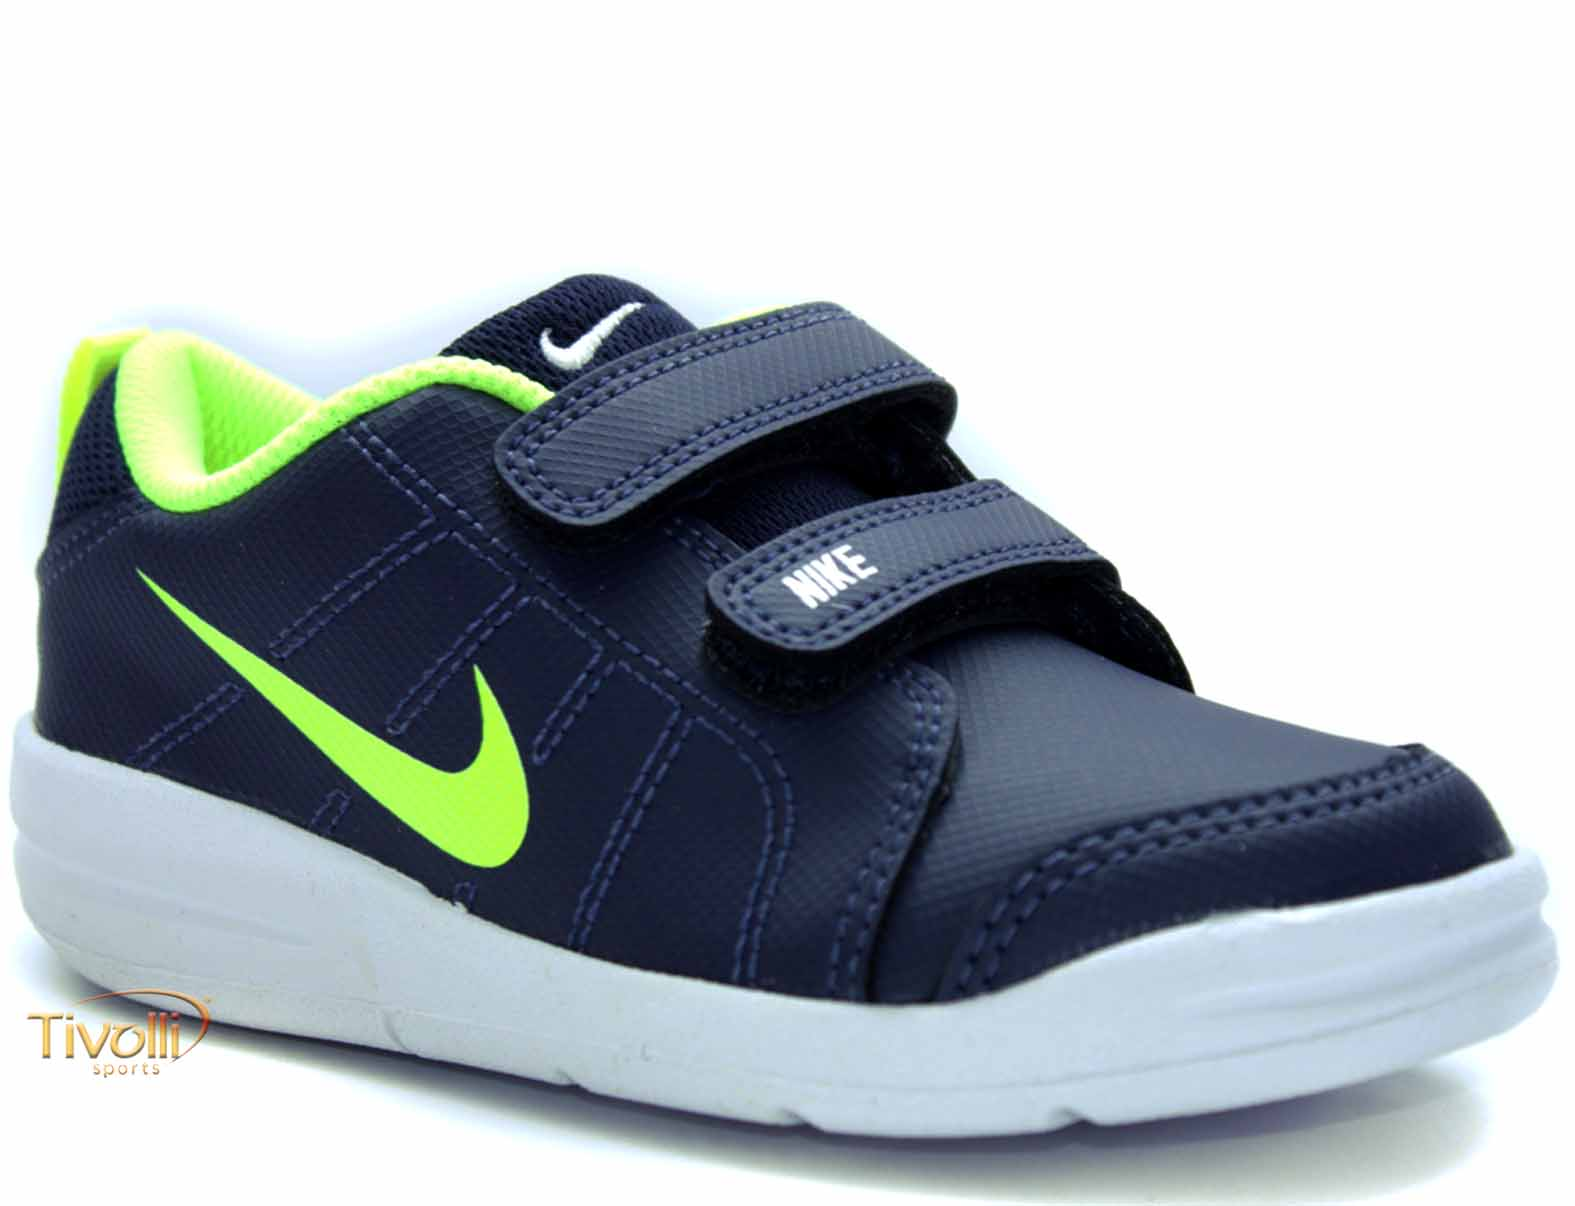 1b637eaad9 Tênis Nike Pico LT (TDV) Infantil   Tamanho 20 ao 26 - Azul Marinho ...